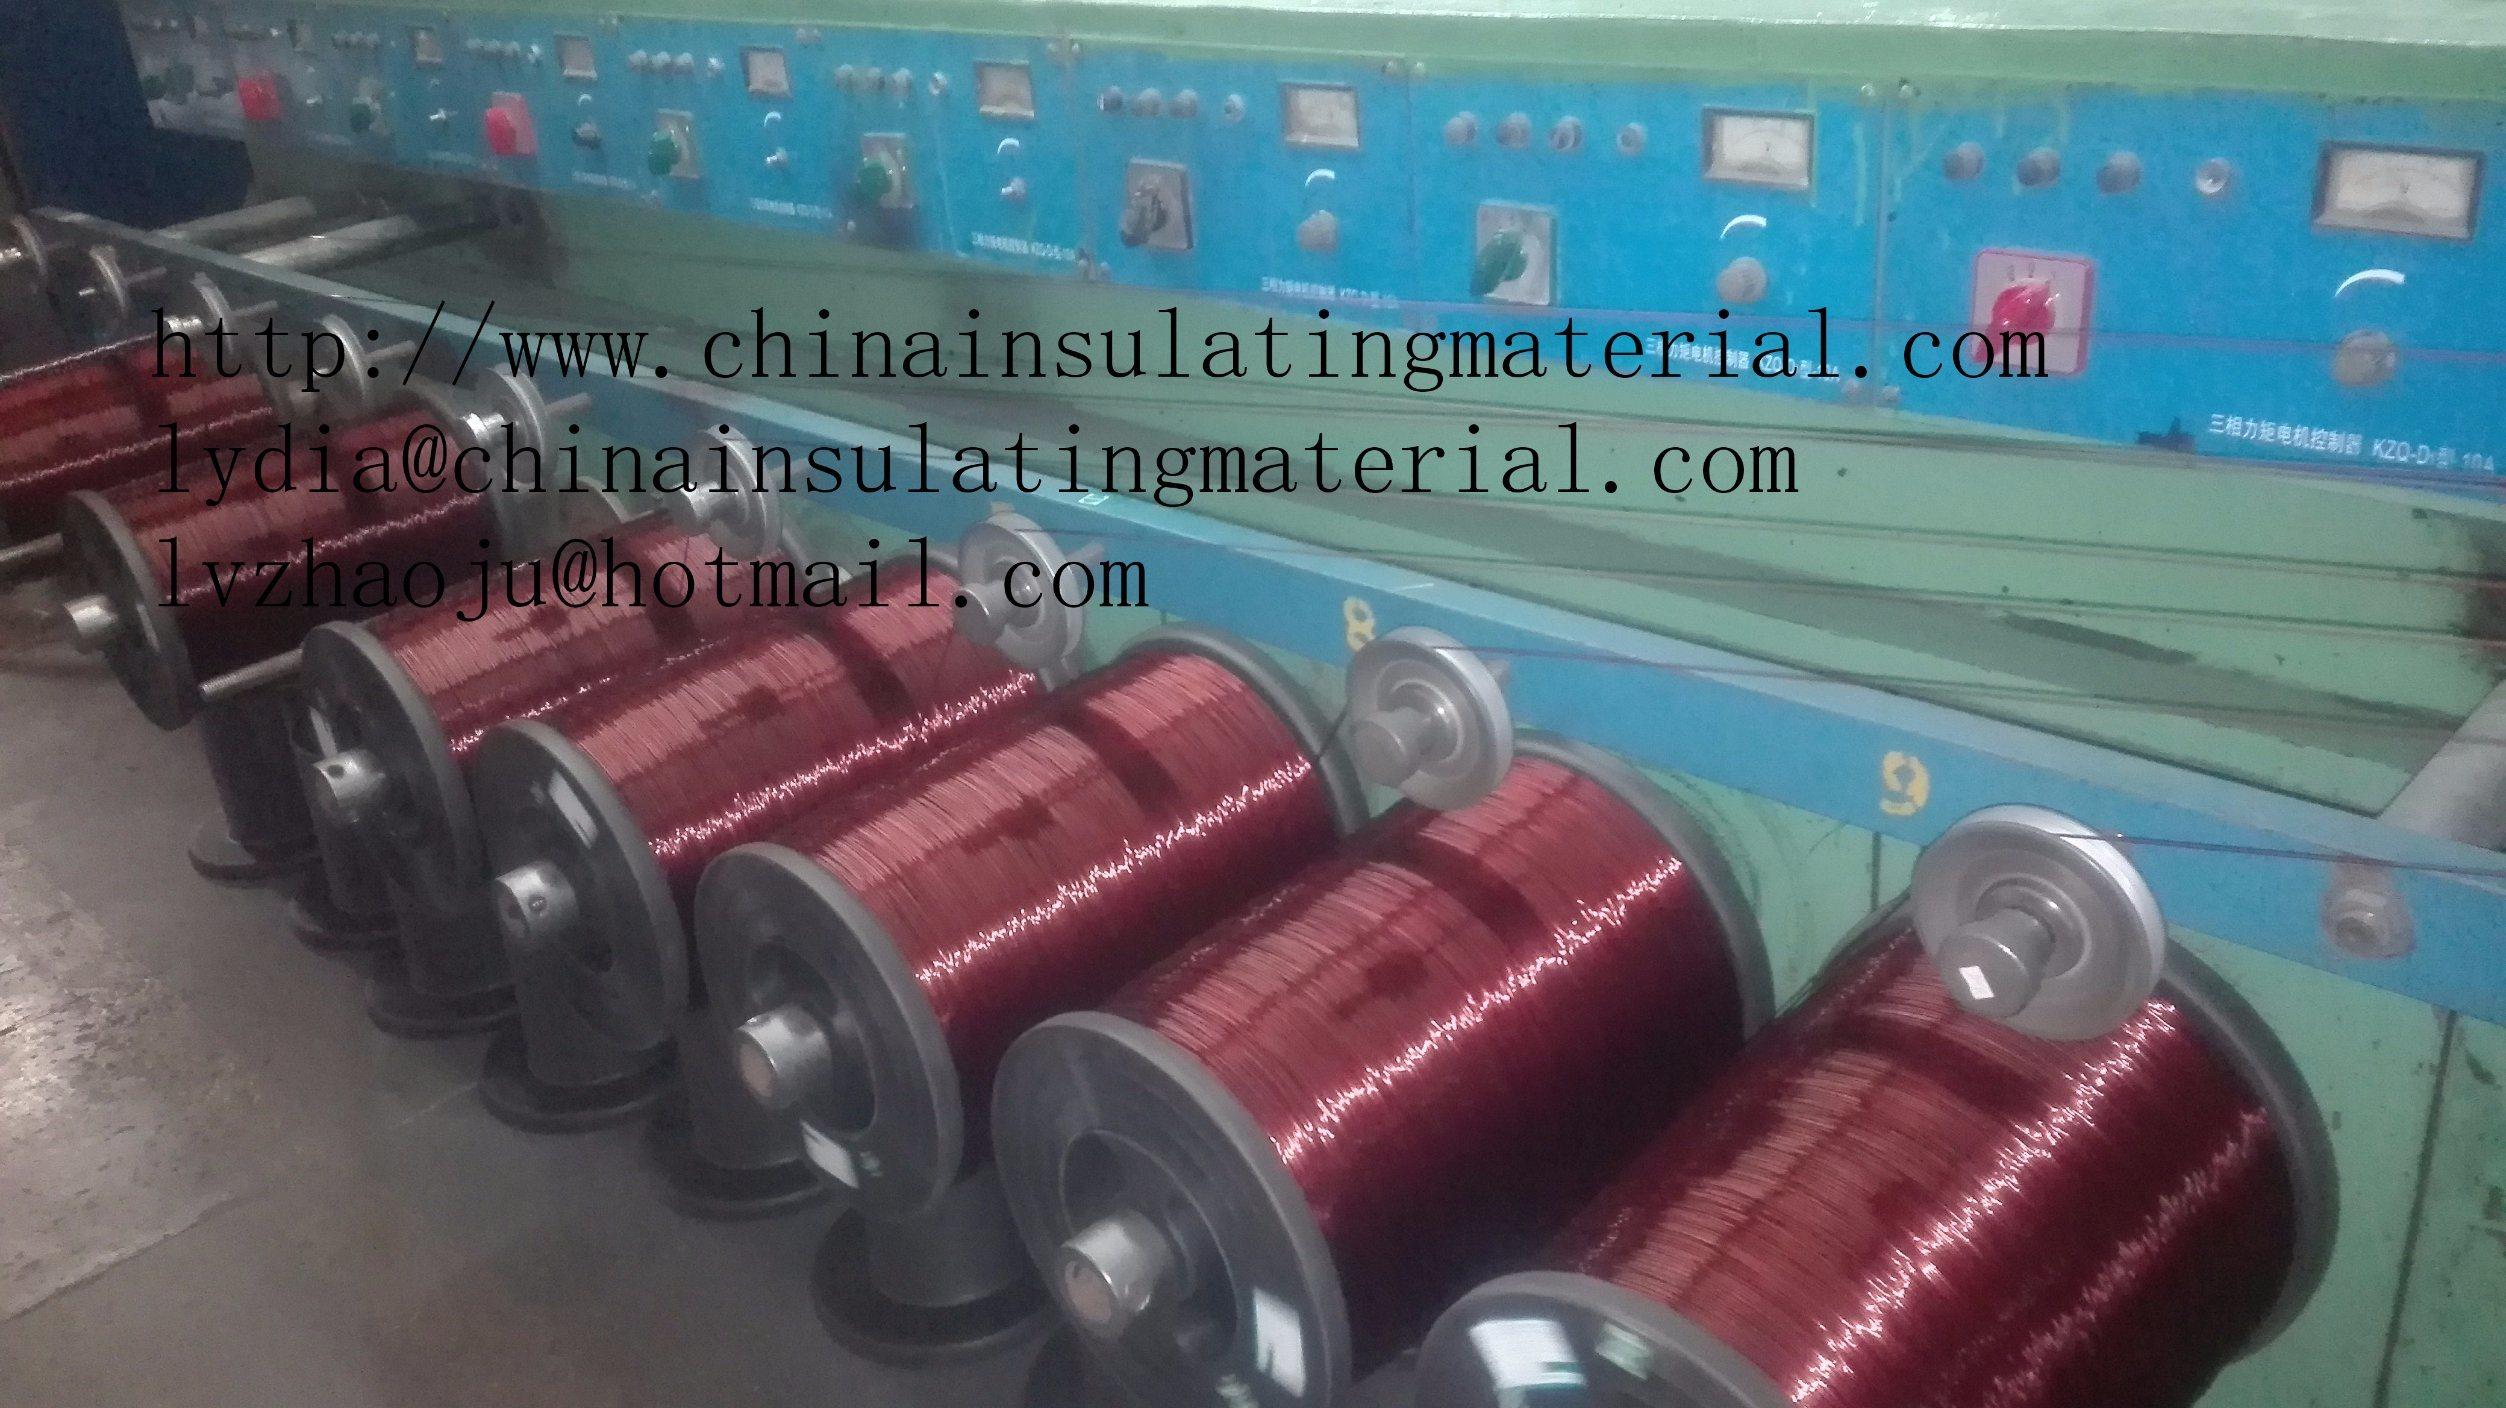 China Polyester Enameled Al Round Wire 155 Degree - China Enameled ...